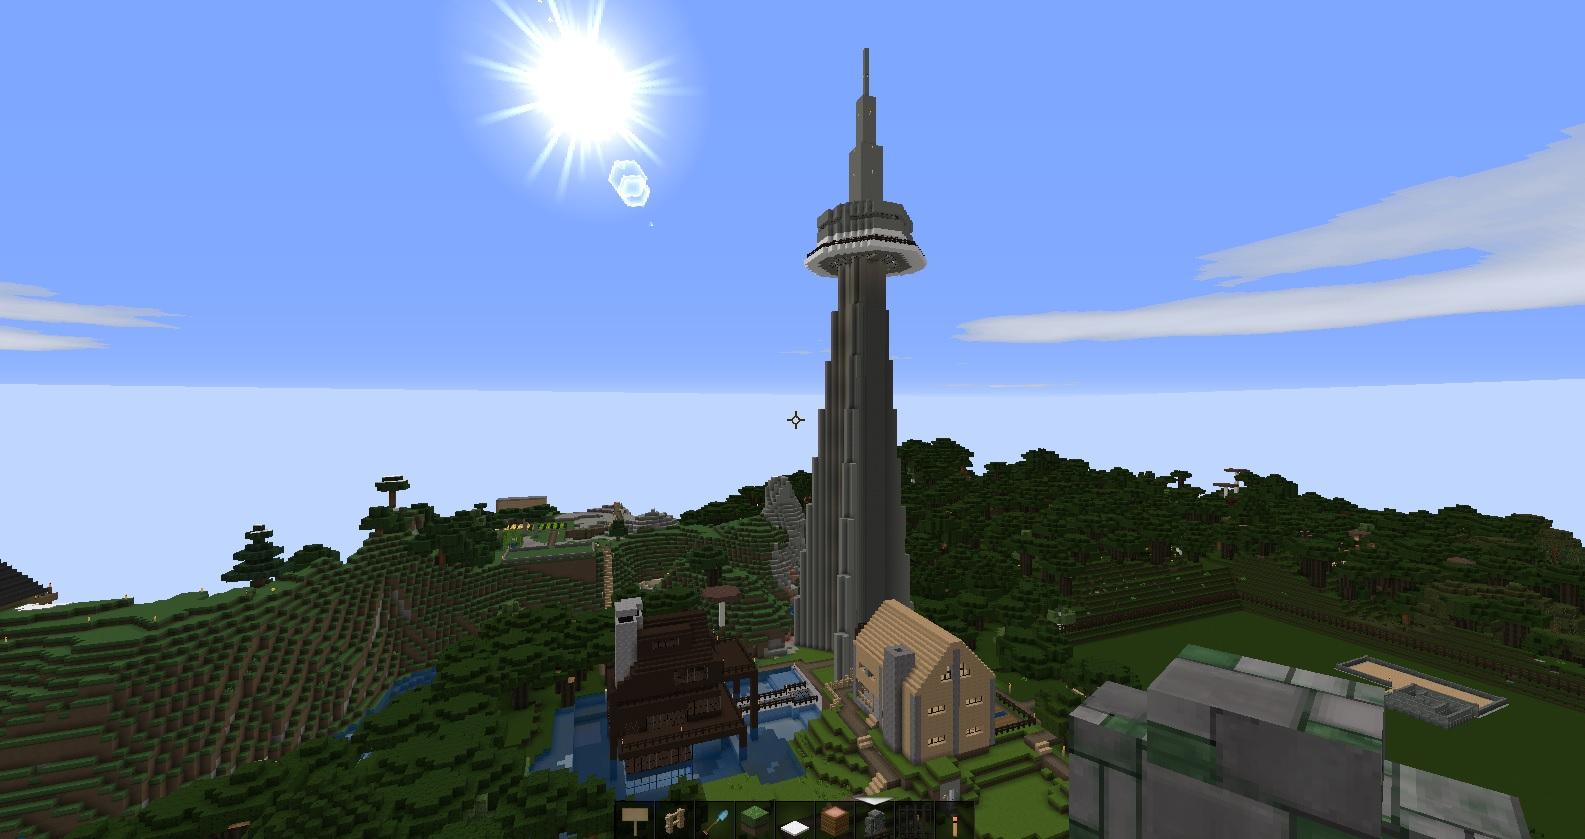 Updated Craftbukkit 24 7 1 12 1 Minecraft Server Pc Servers Servers Java Edition Minecraft Forum Minecraft Forum